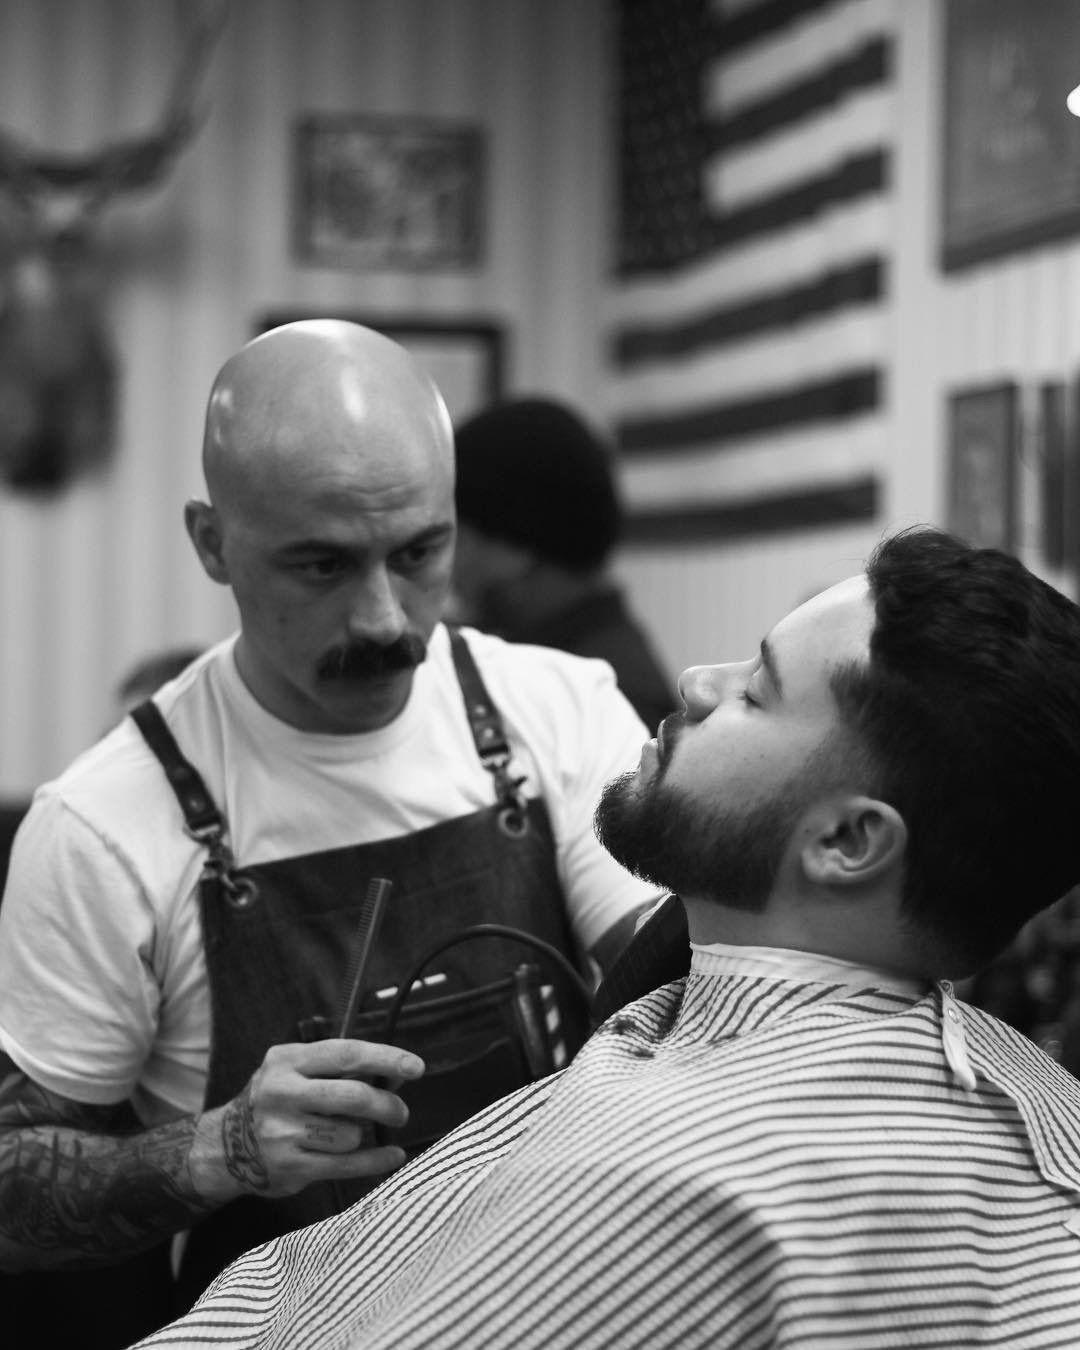 Moustache barber male pattern baldness hair a